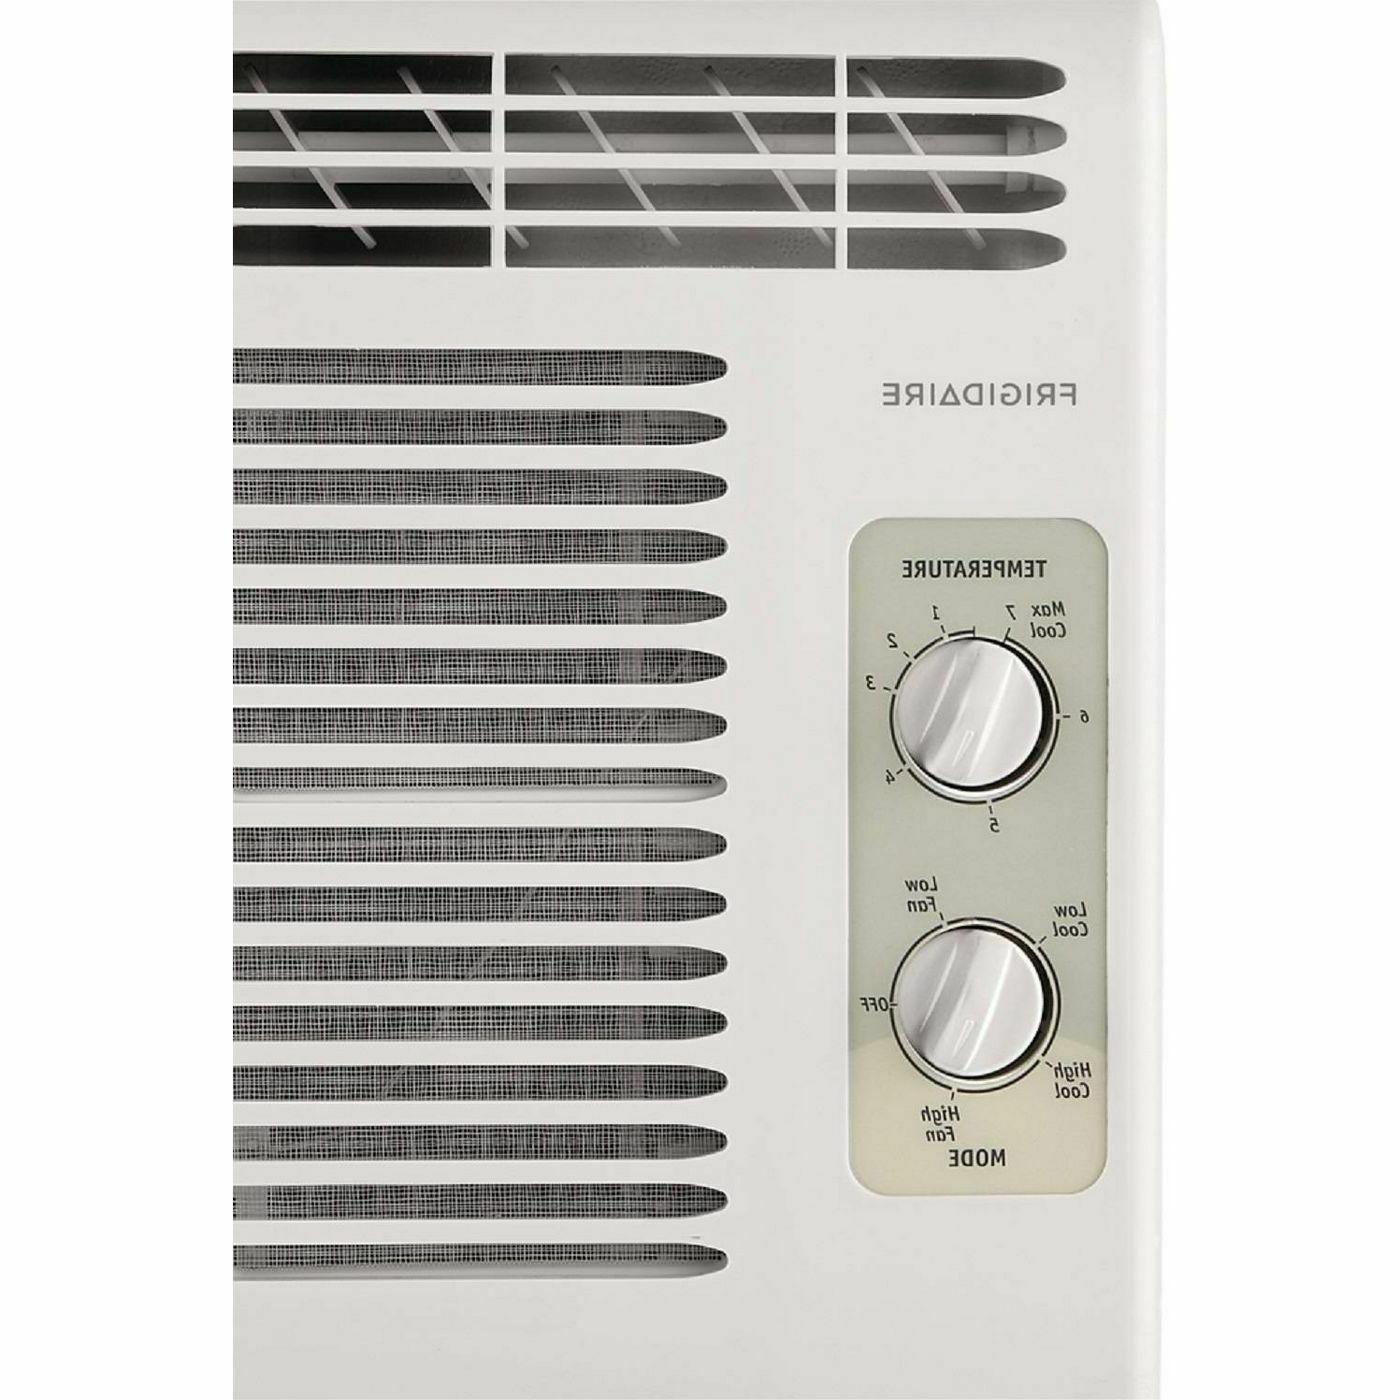 Frigidaire Window Conditioner, Sq Home AC Unit Mount